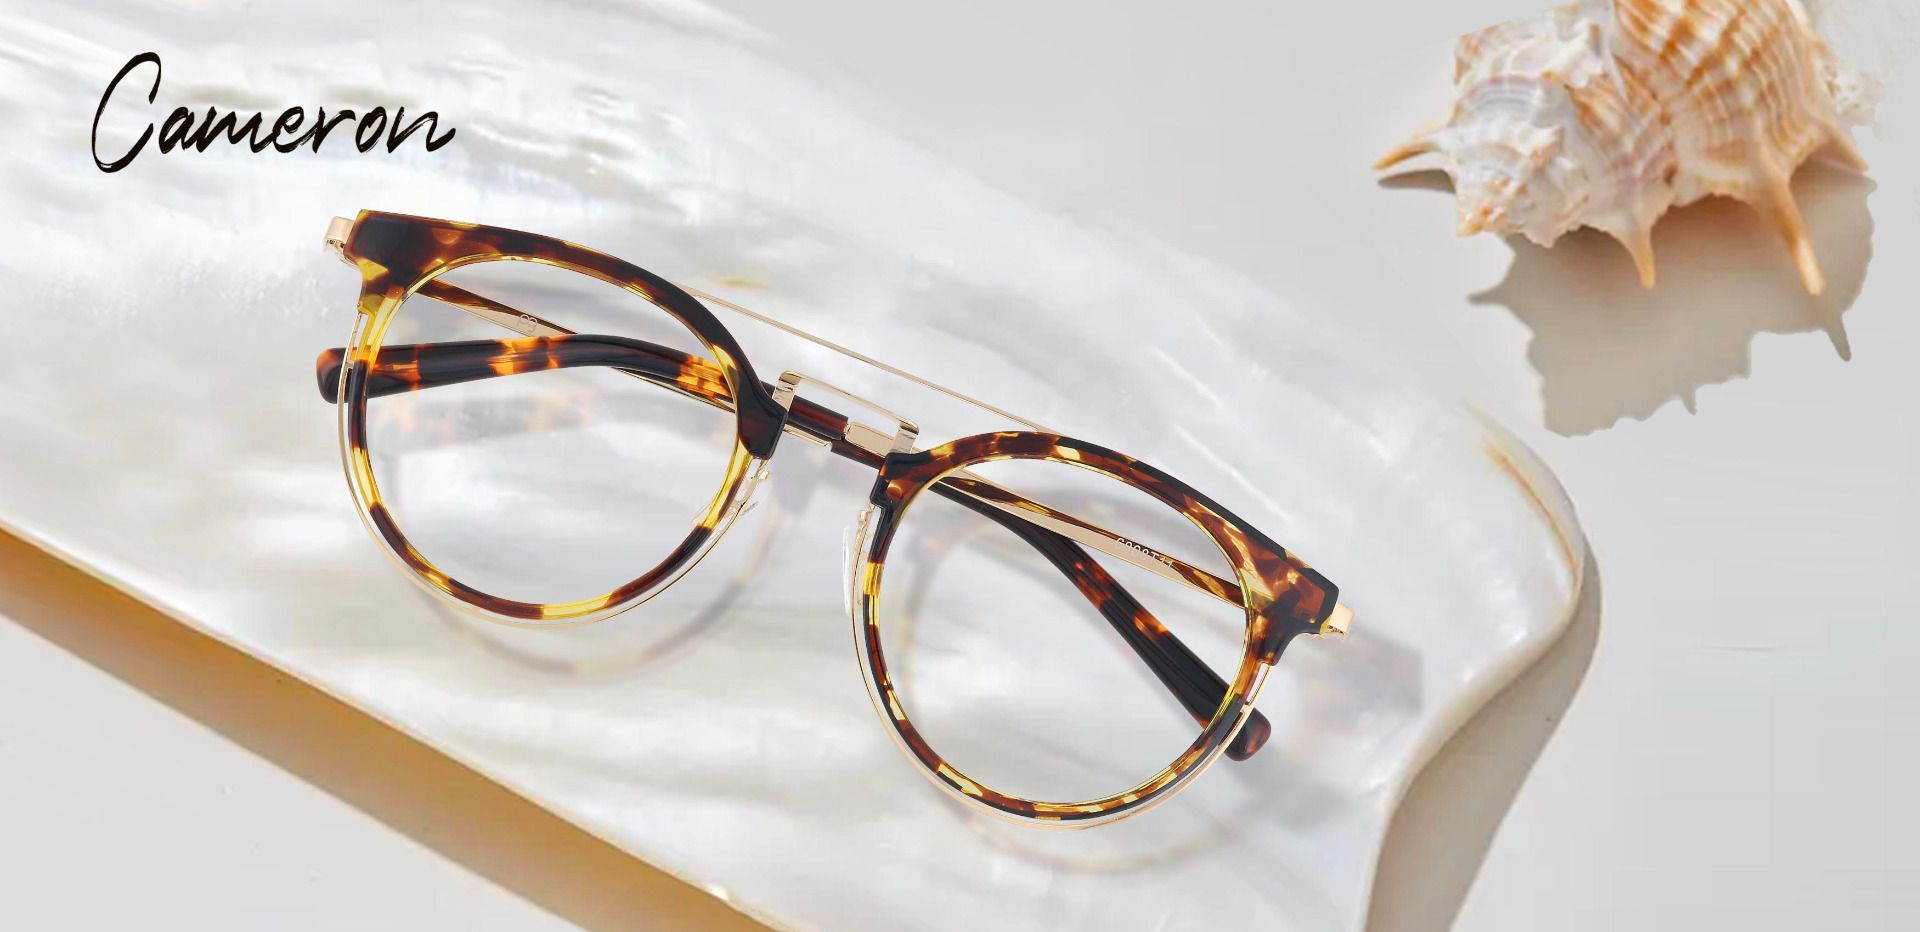 Cameron Aviator Prescription Glasses - Tortoise